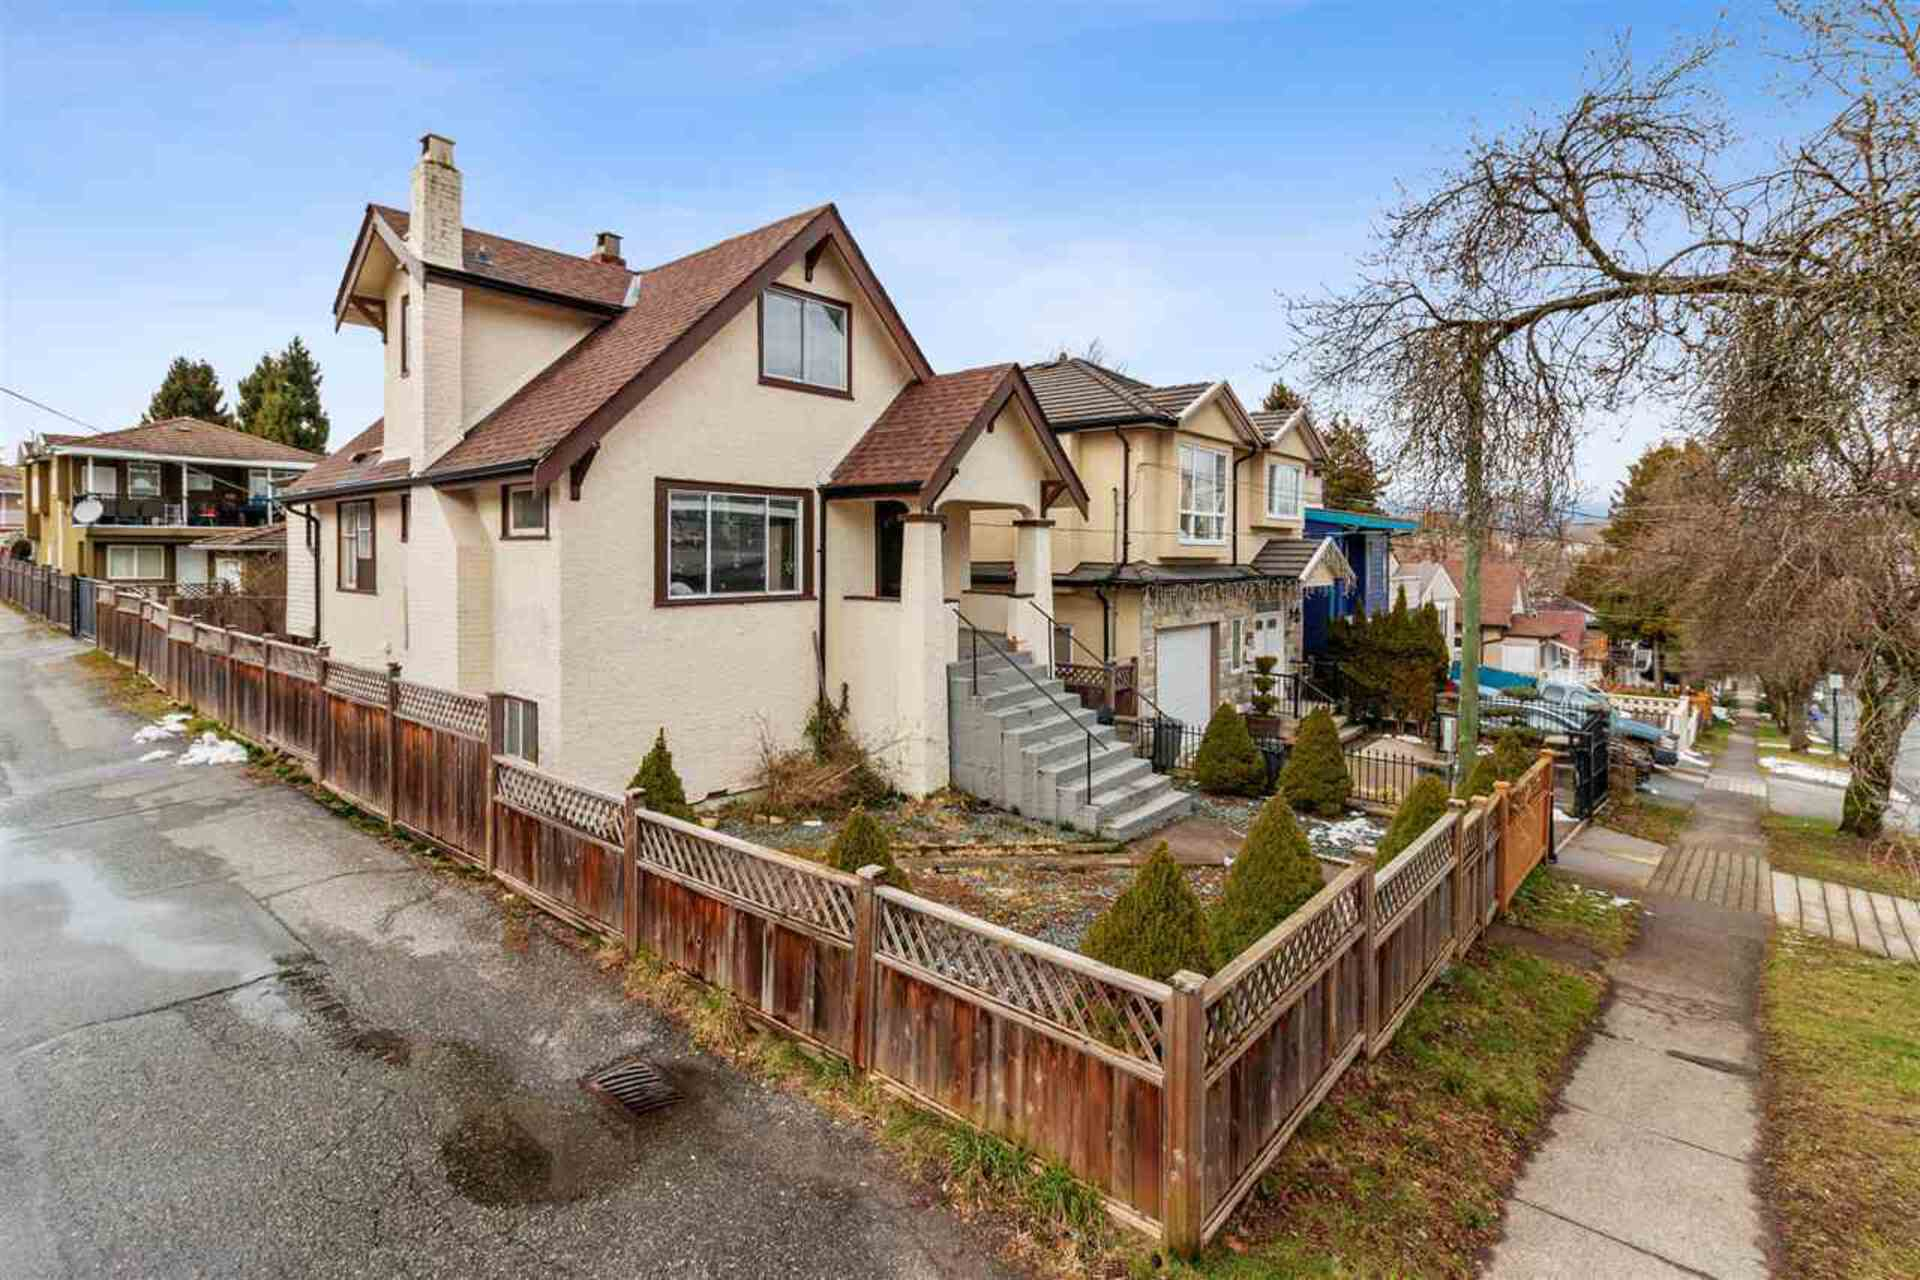 5375-mckinnon-street-collingwood-ve-vancouver-east-01 at 5375 Mckinnon Street, Collingwood VE, Vancouver East